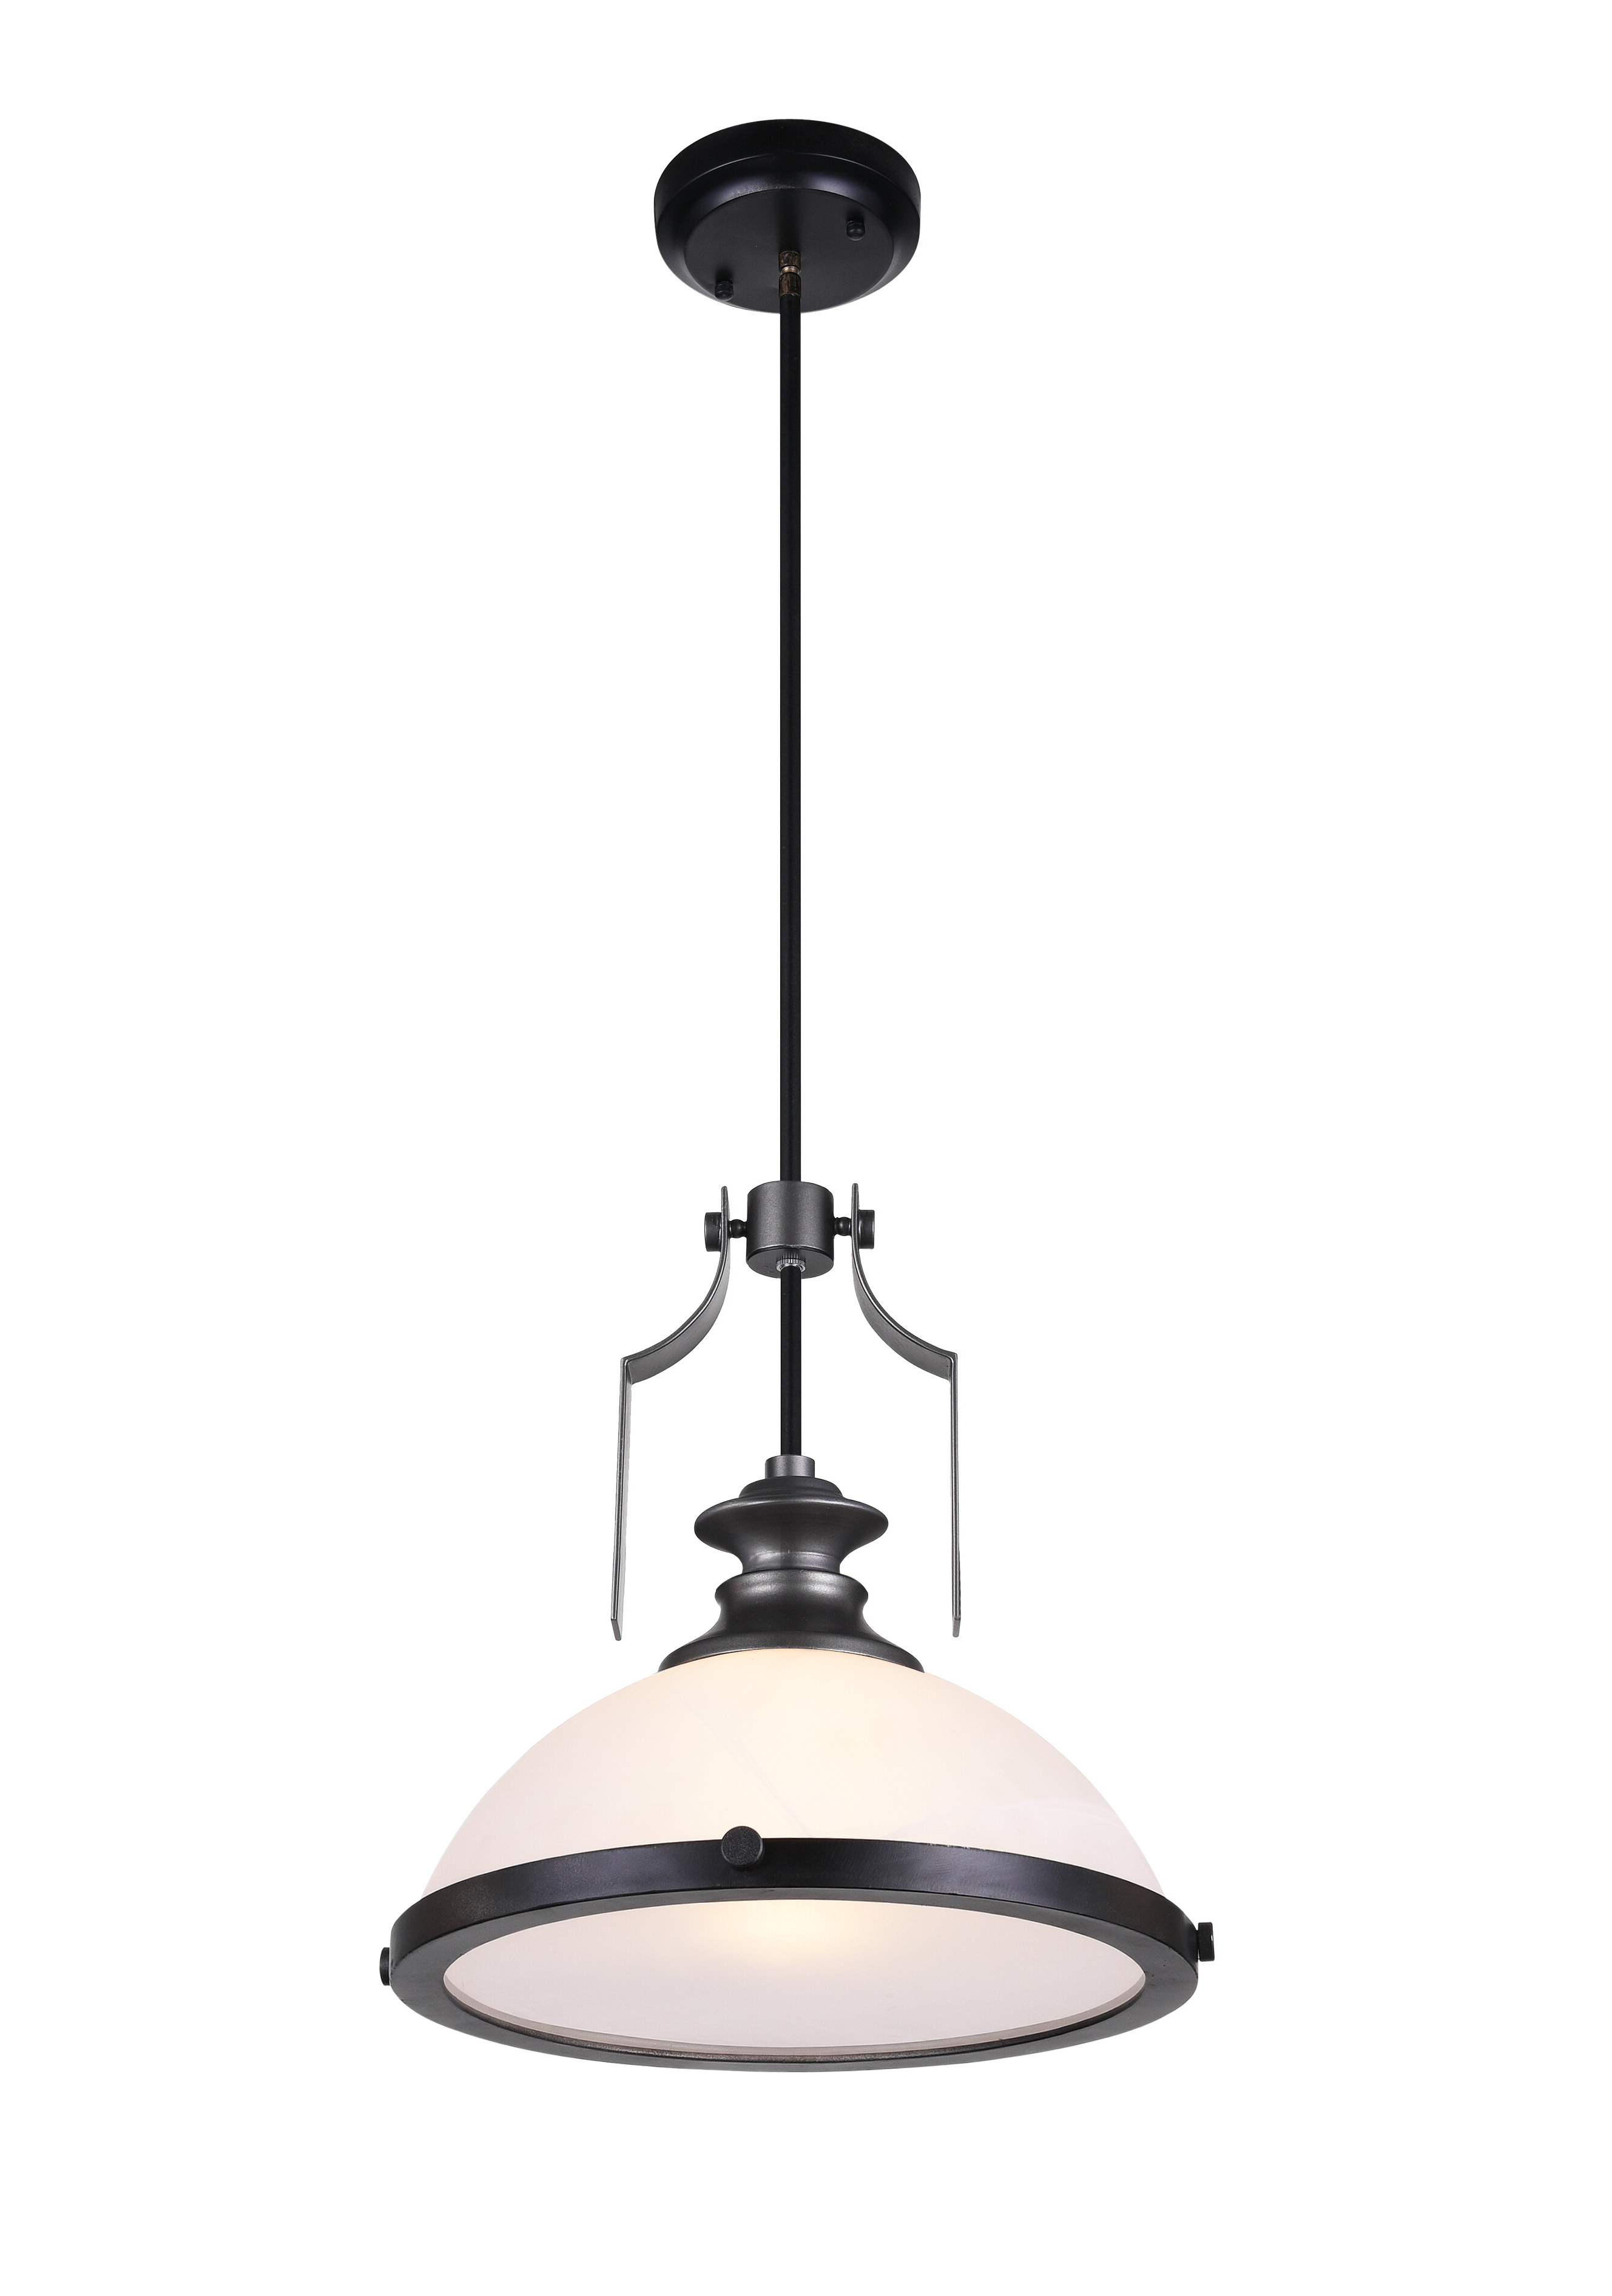 Detti 1-Light Dome Pendant with 2020 Terry 1-Light Single Bell Pendants